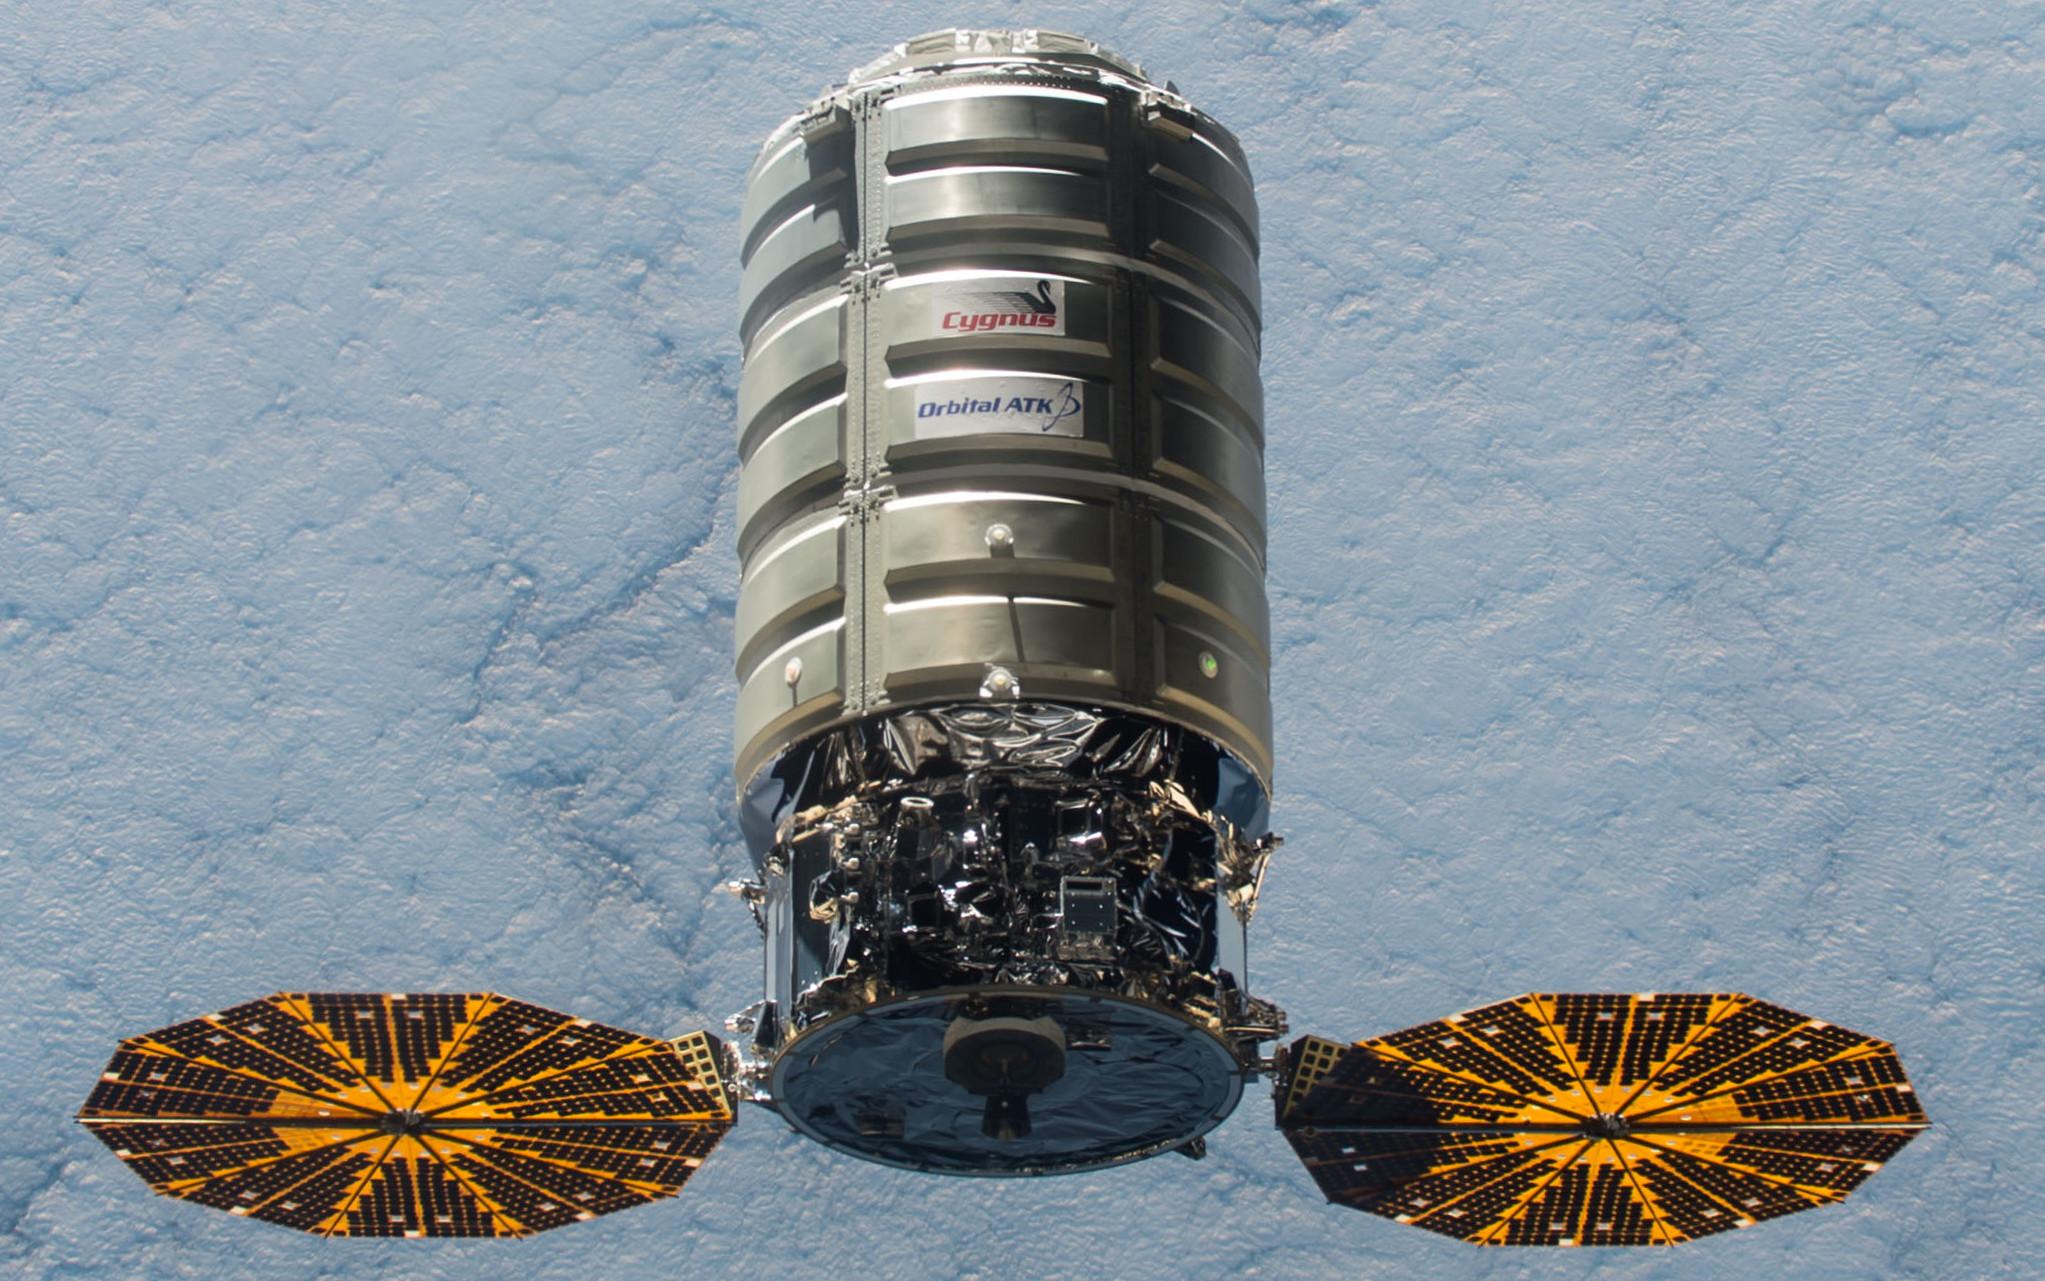 Northrop Grumman Orbital ATK Cygnus approaching the International Space Station